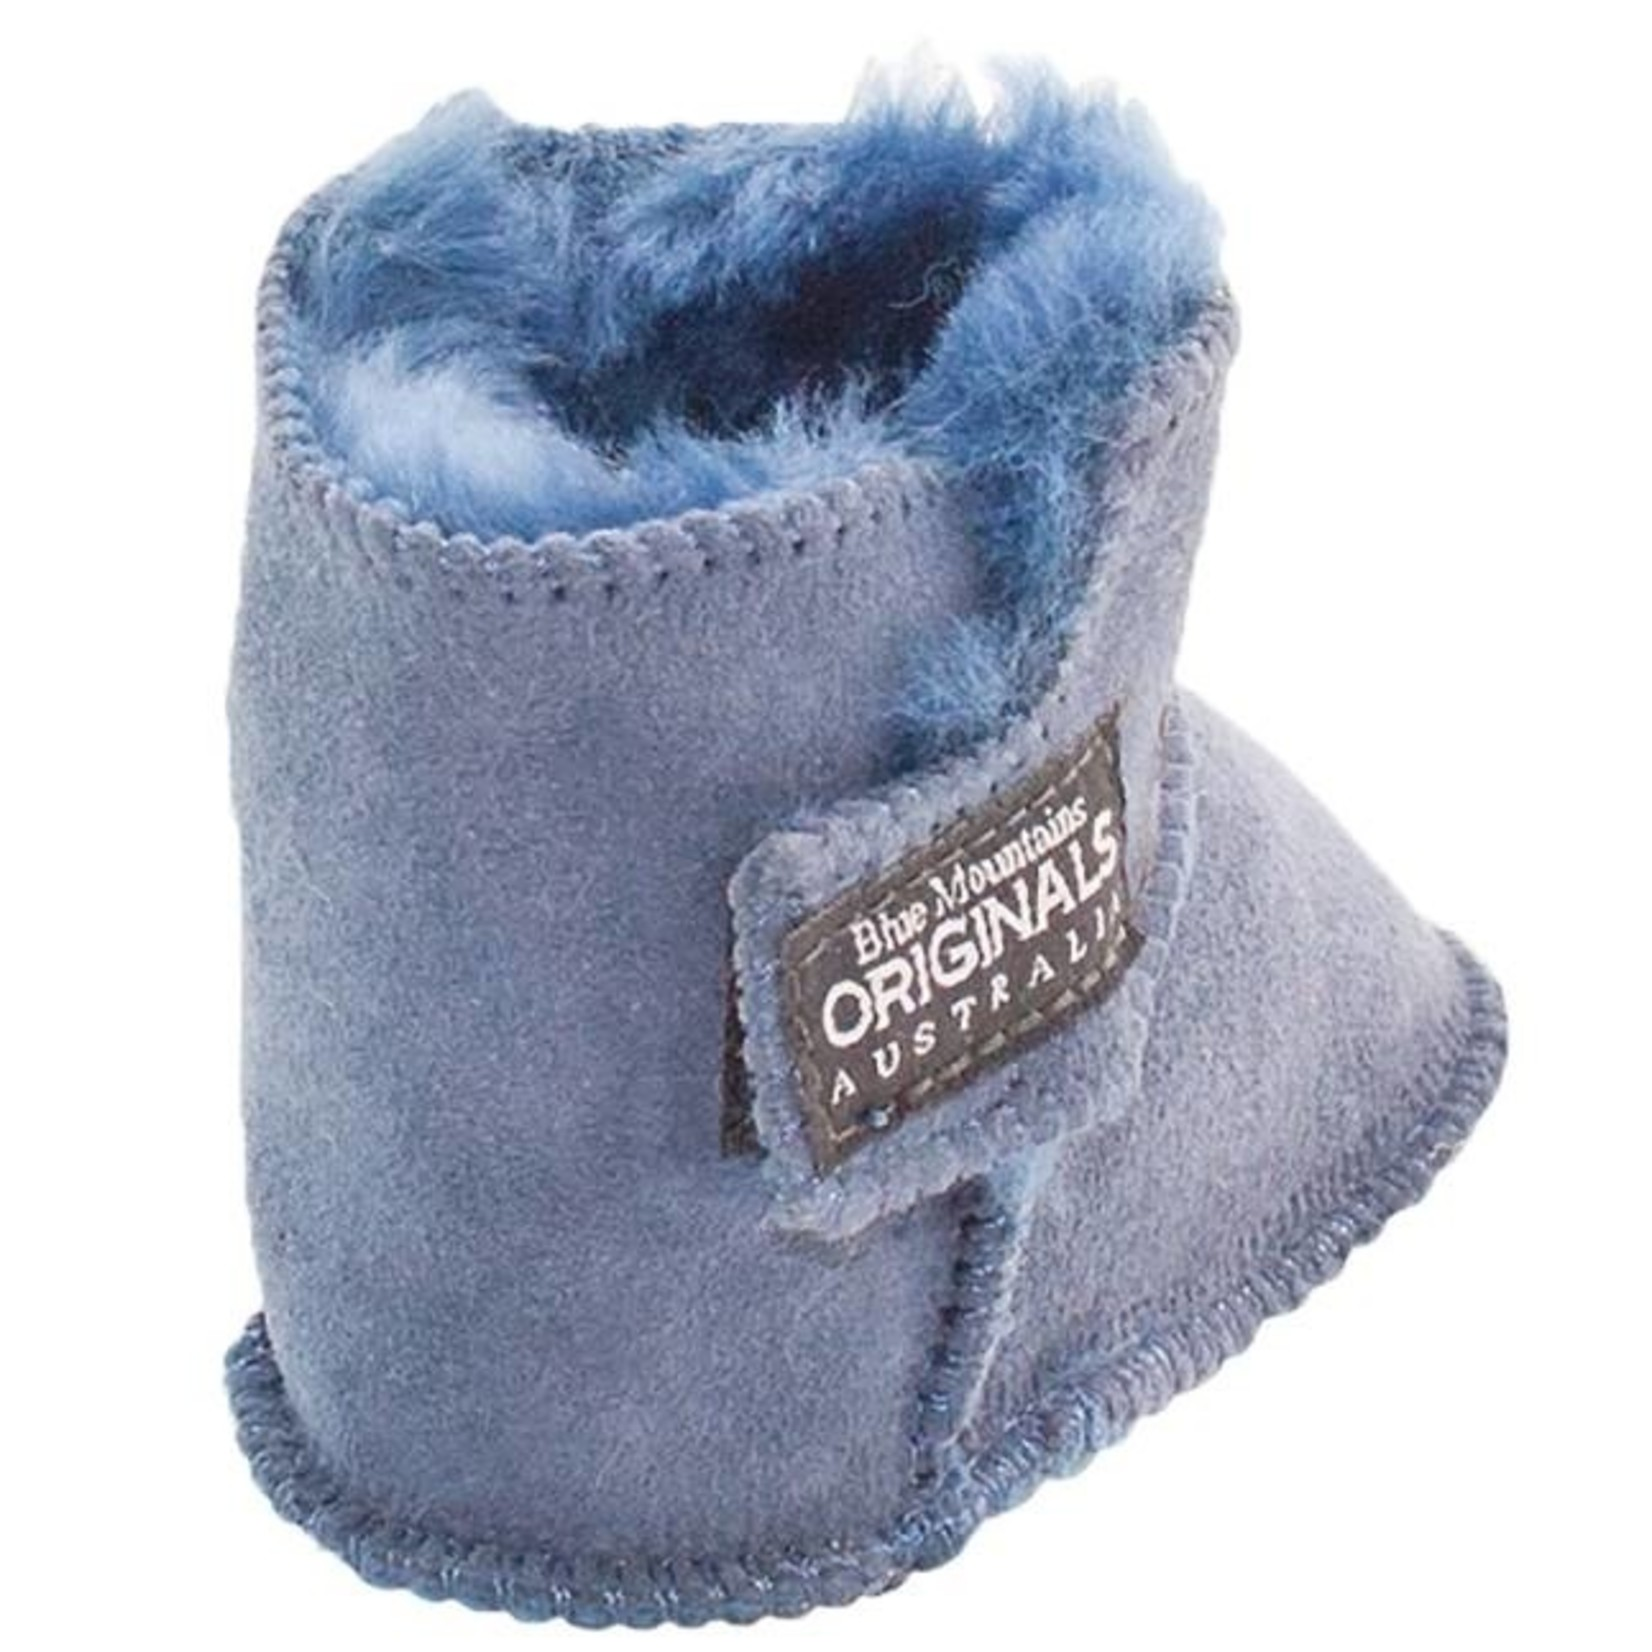 BMO BMO Baby Boot Velcro